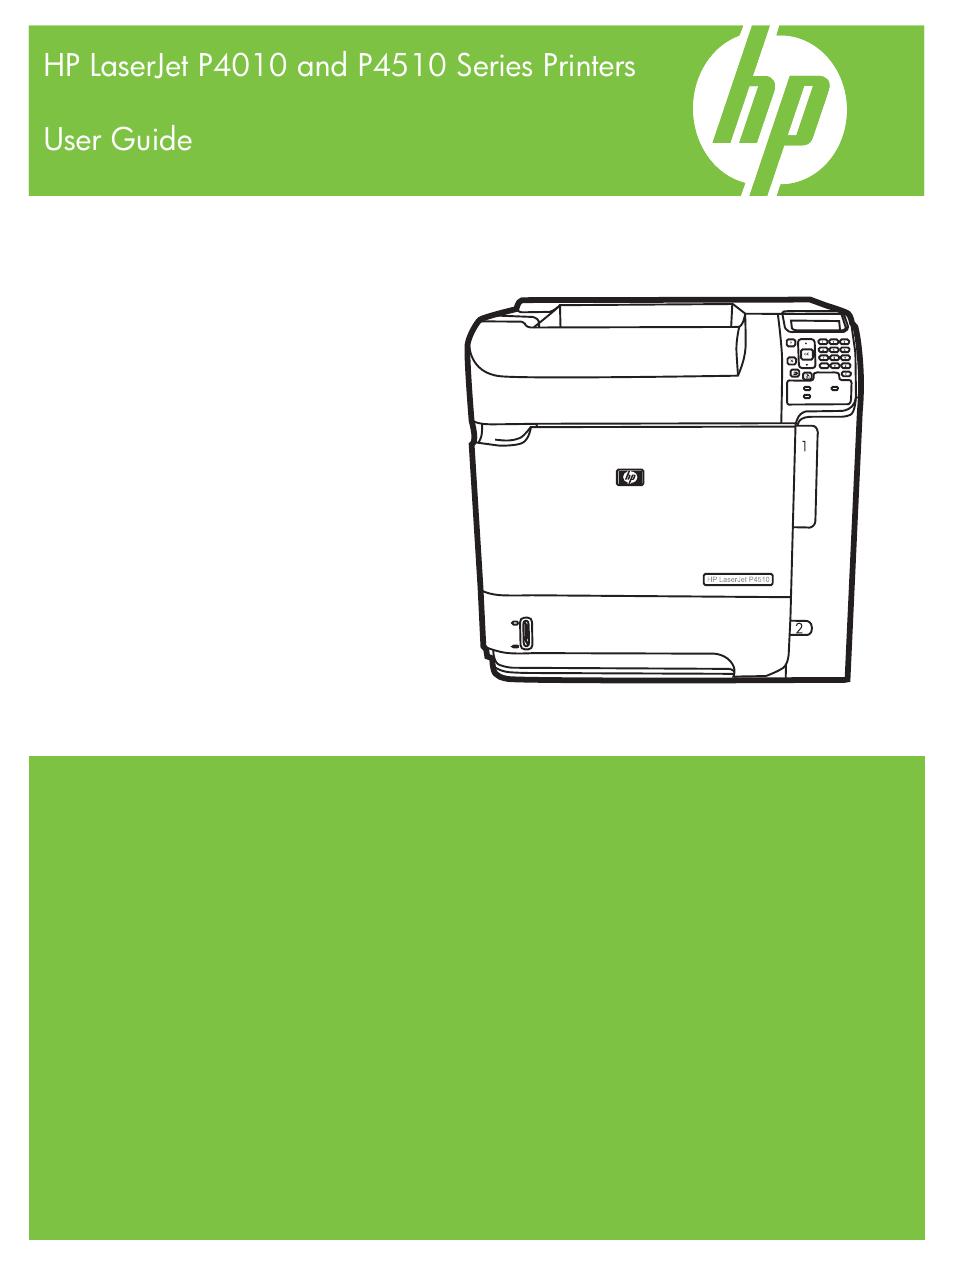 HP LaserJet P4015 Printer series User Manual | 246 pages | Also for:  LaserJet P4510 Printer series, LaserJet P4014 Printer series